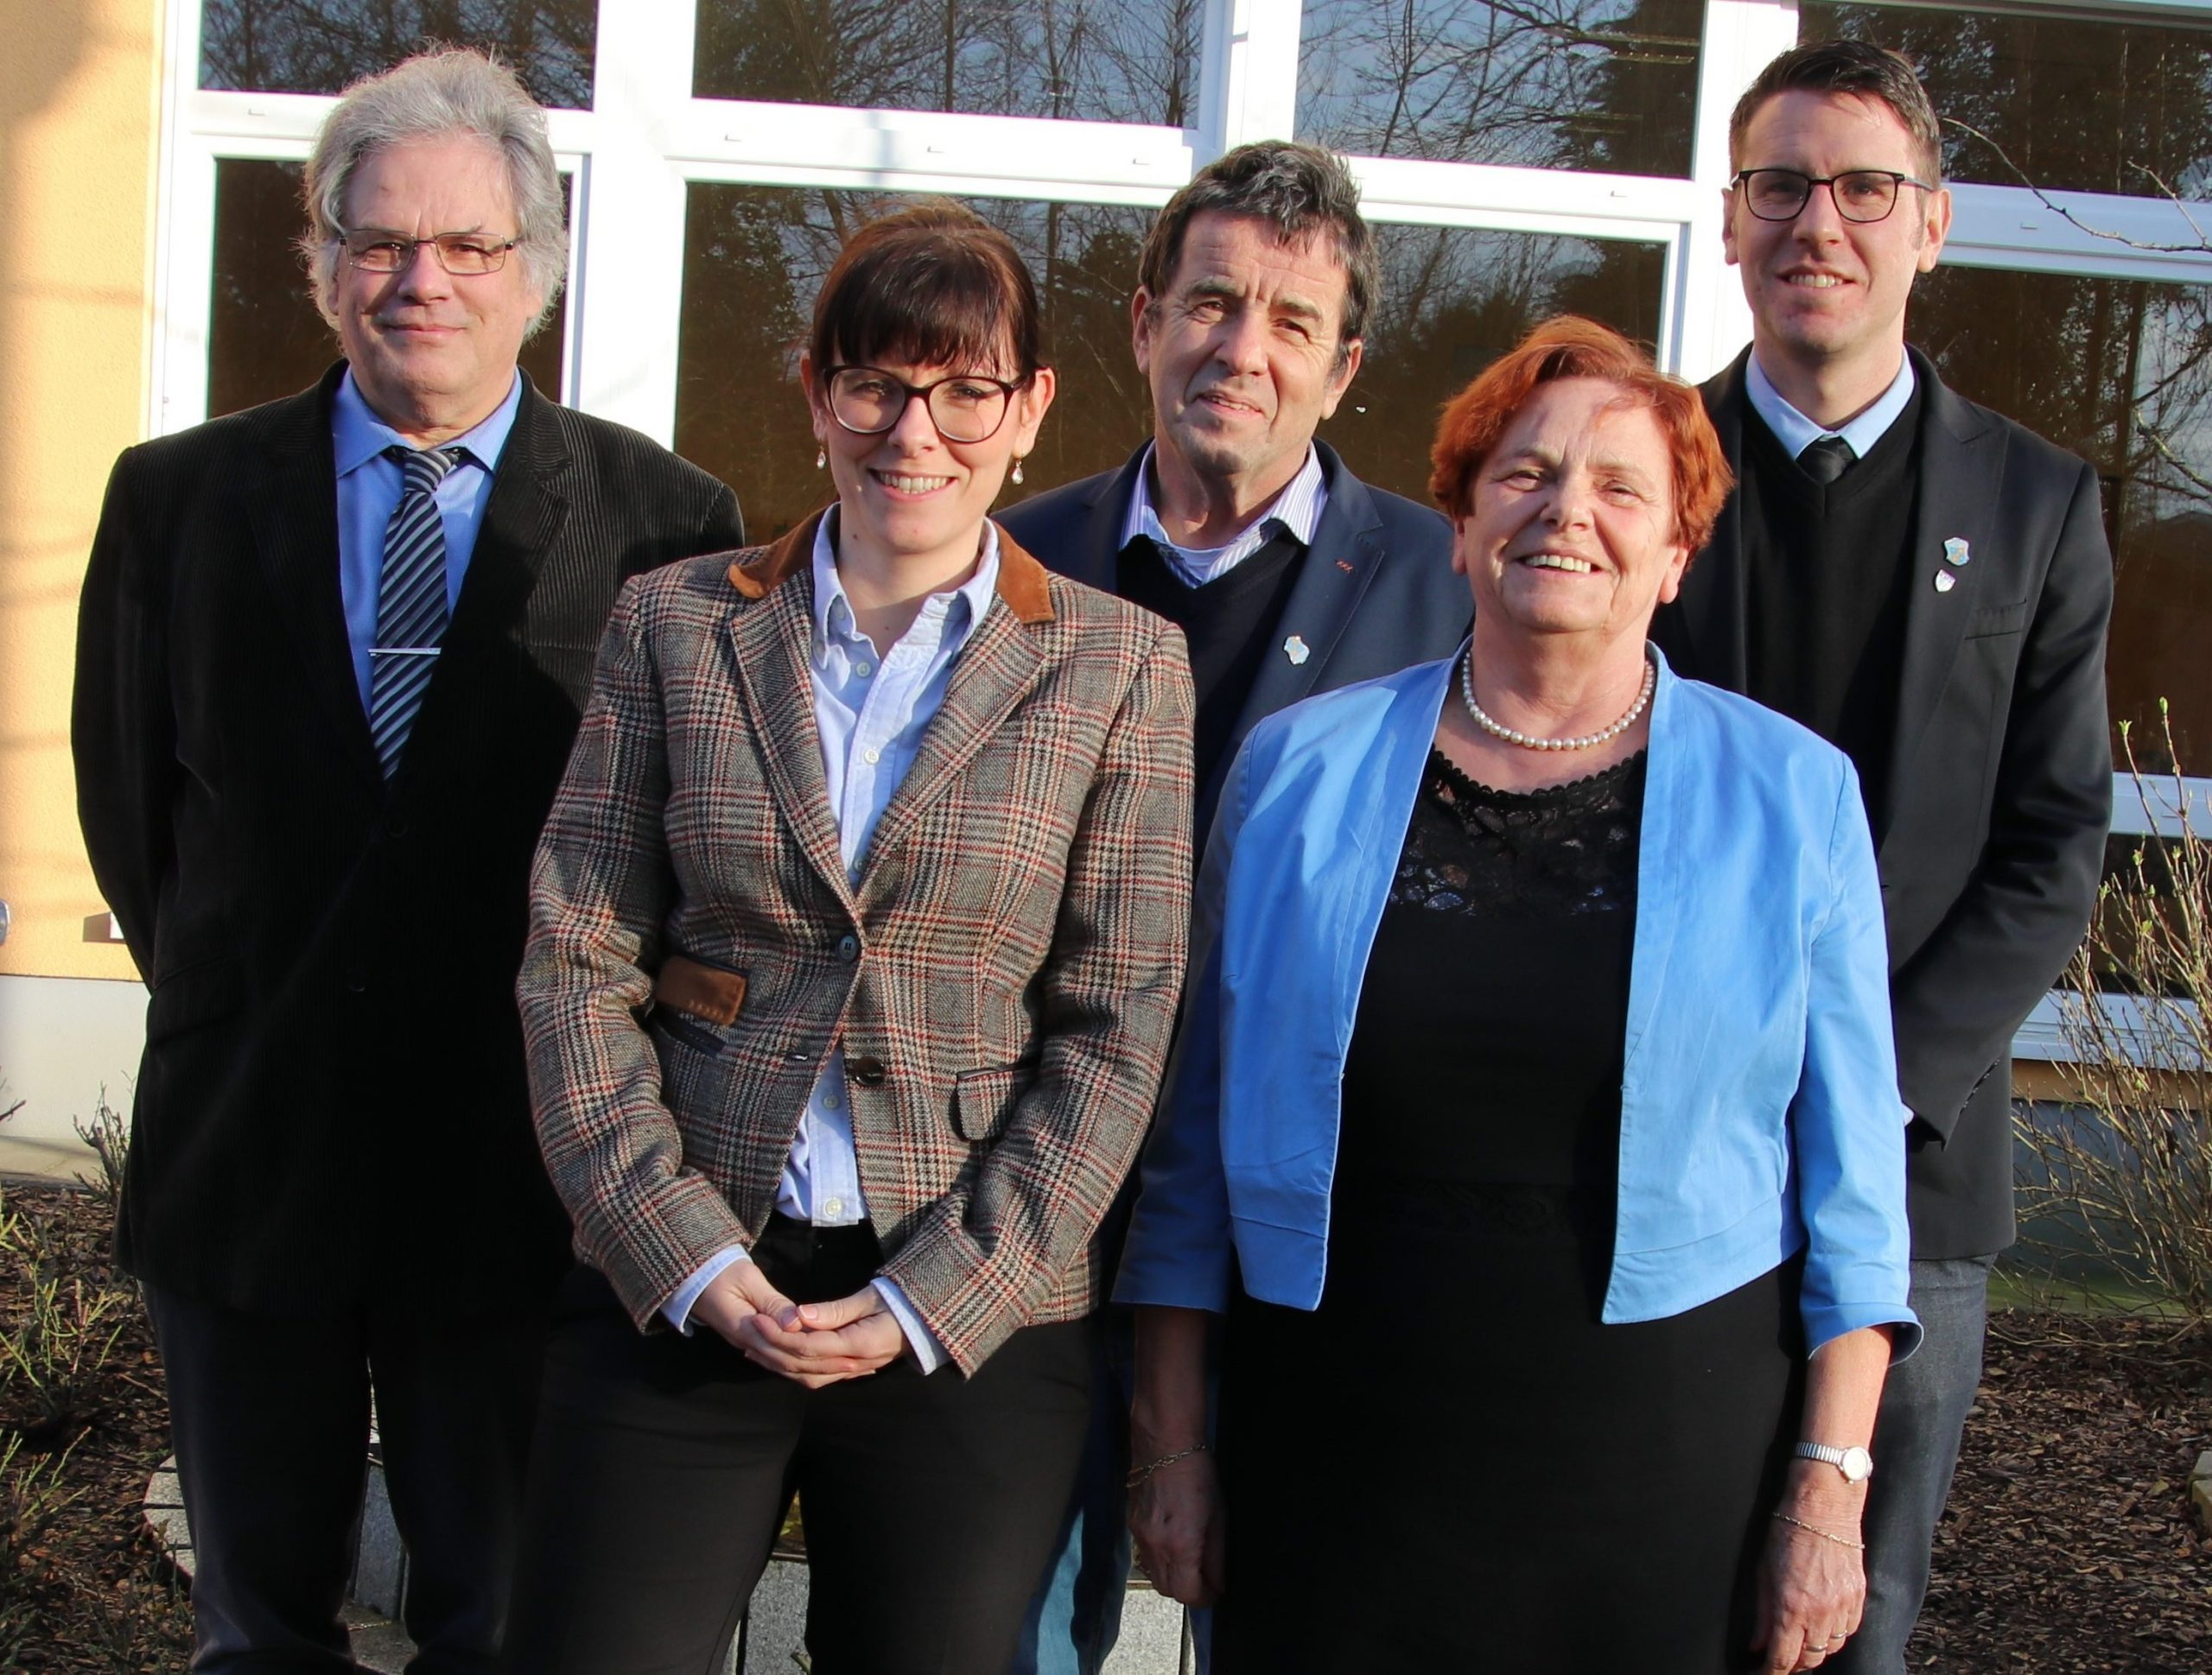 Leibniz Privatschule - Leibniz Privatschule innen Leibniz Privatschule Elmshorn Erfahrungen